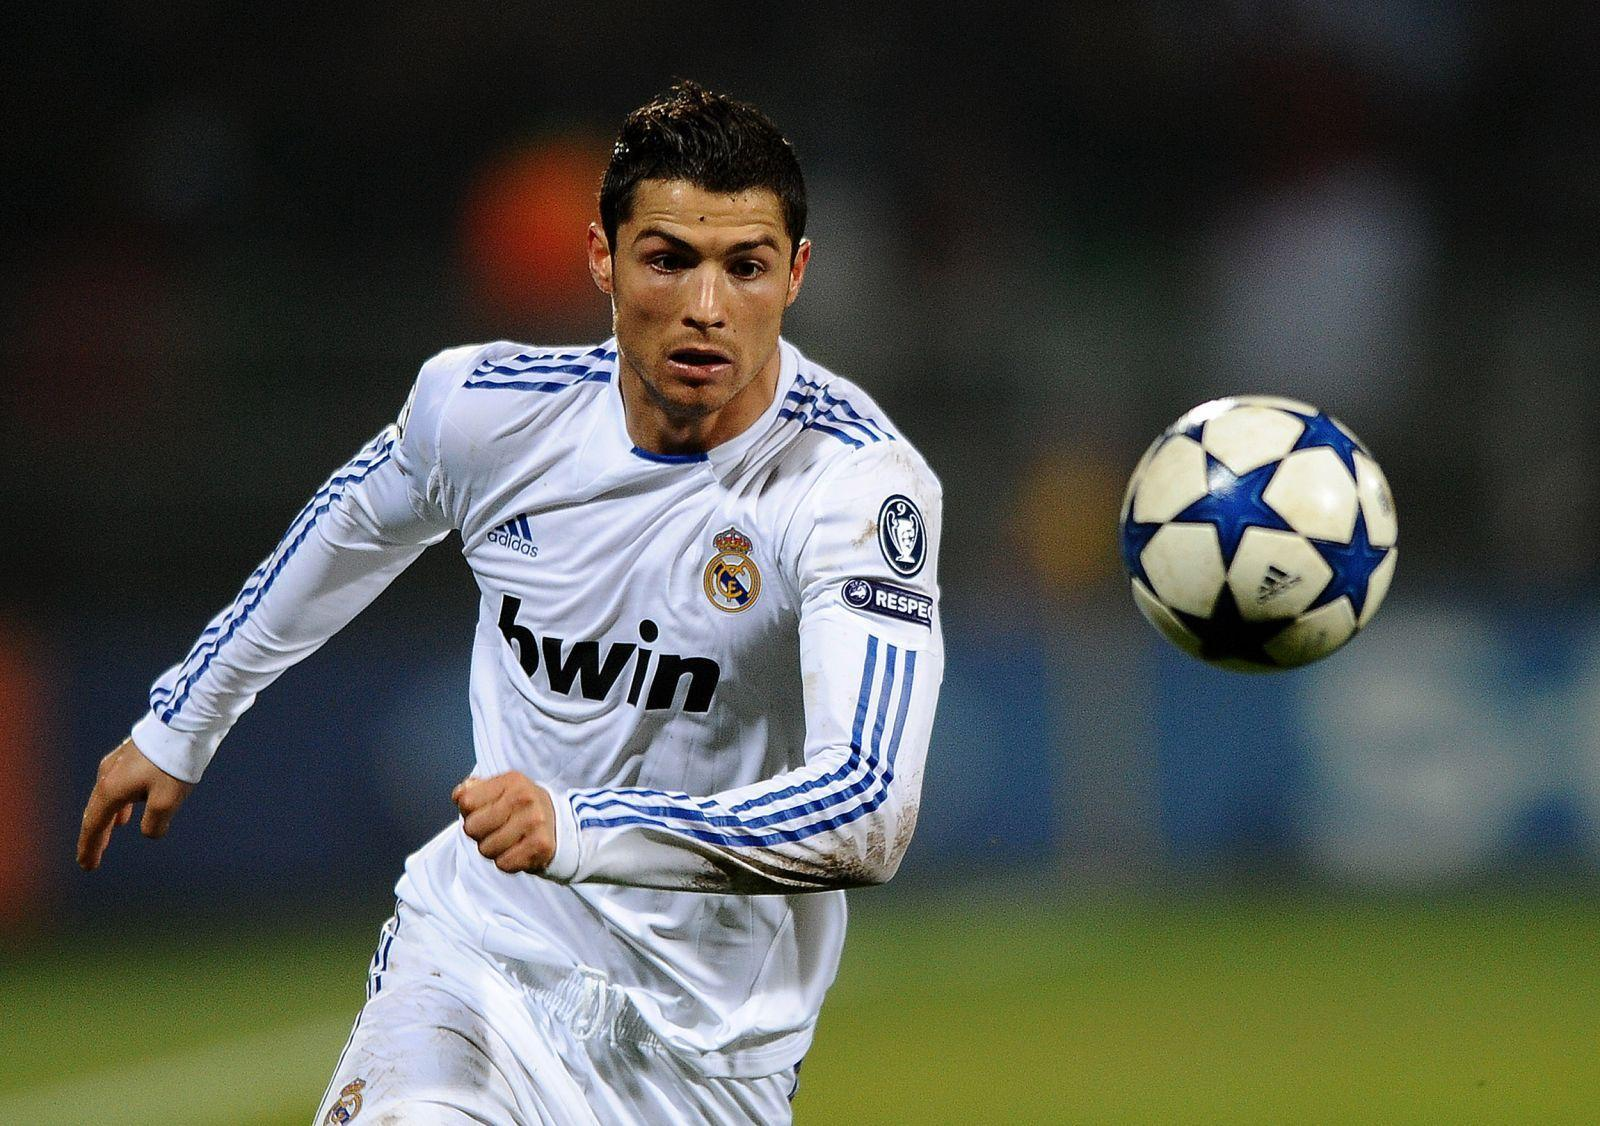 Cristiano Ronaldo HD Wallpapers - HD Wallpapers Inn